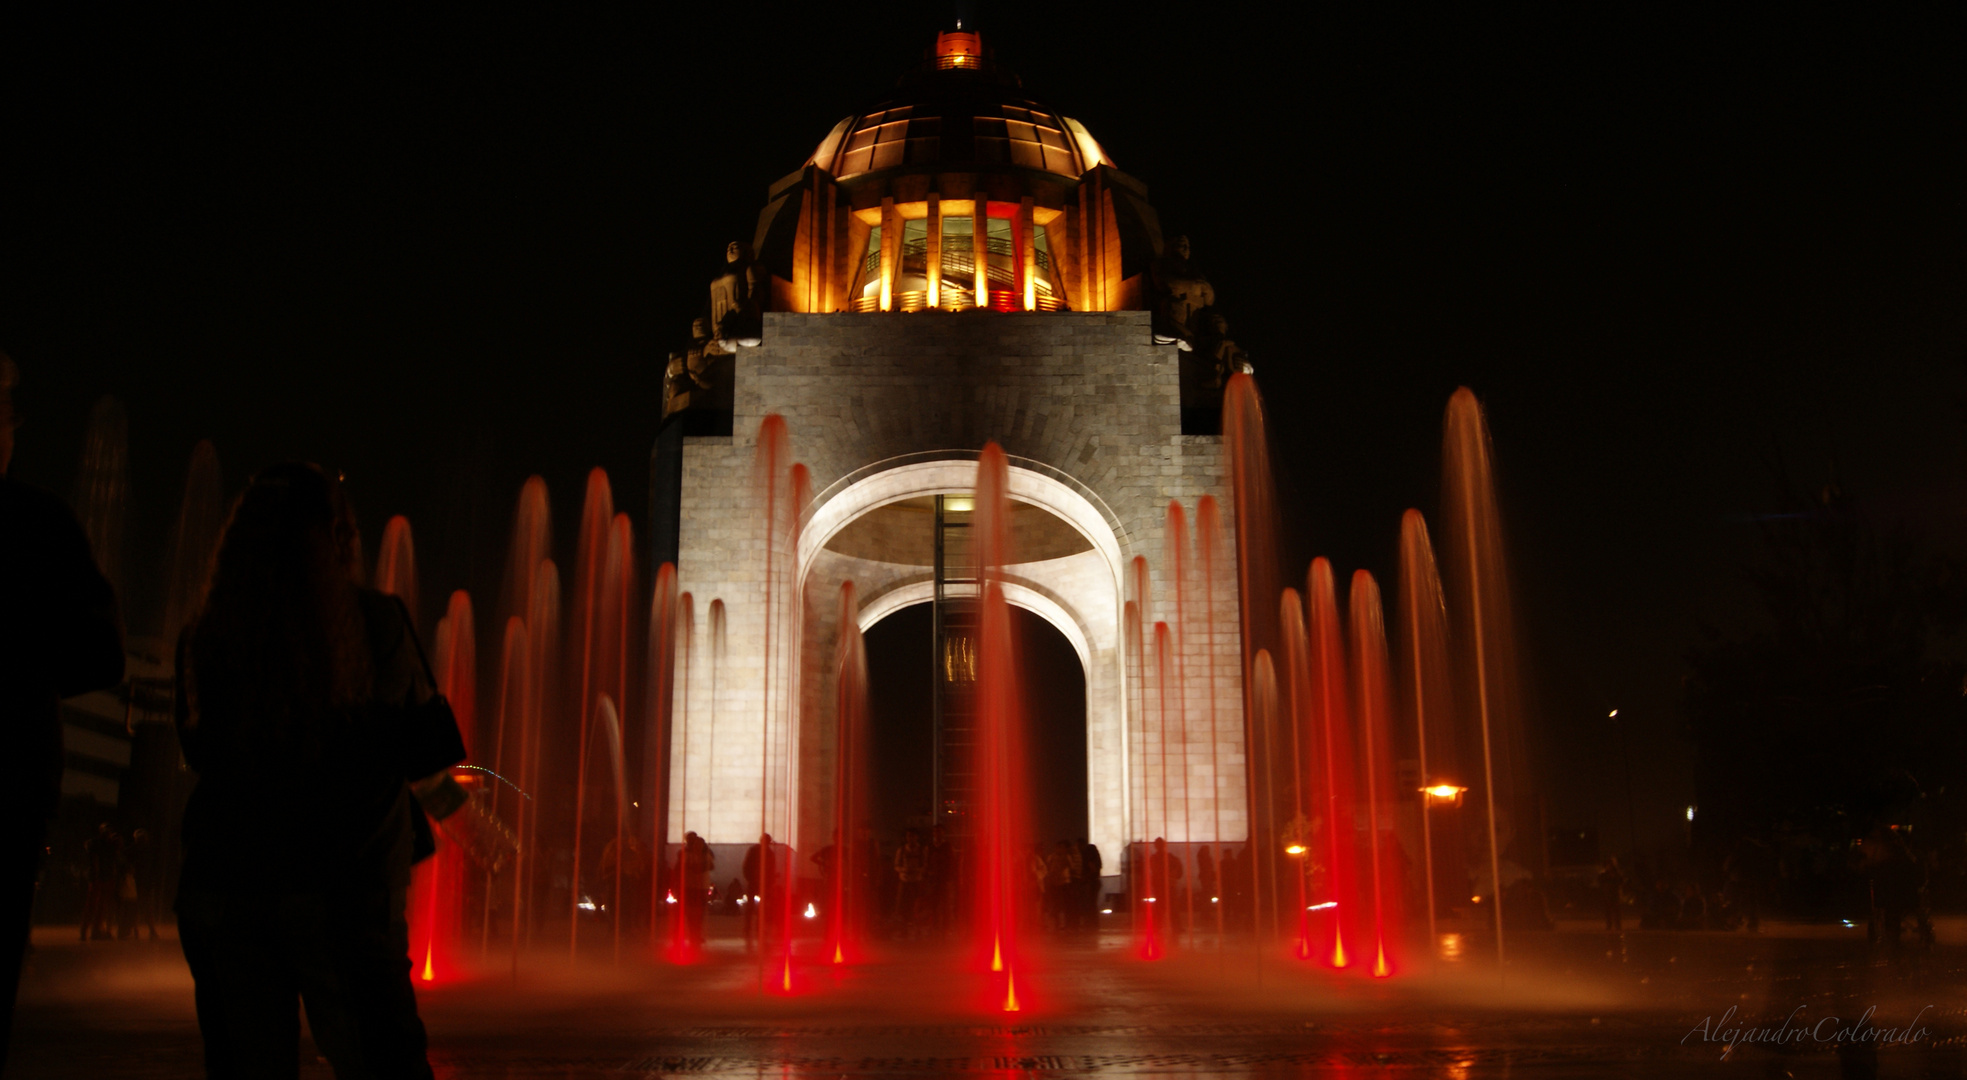 Monumento a la Revolución Mexicana de noche